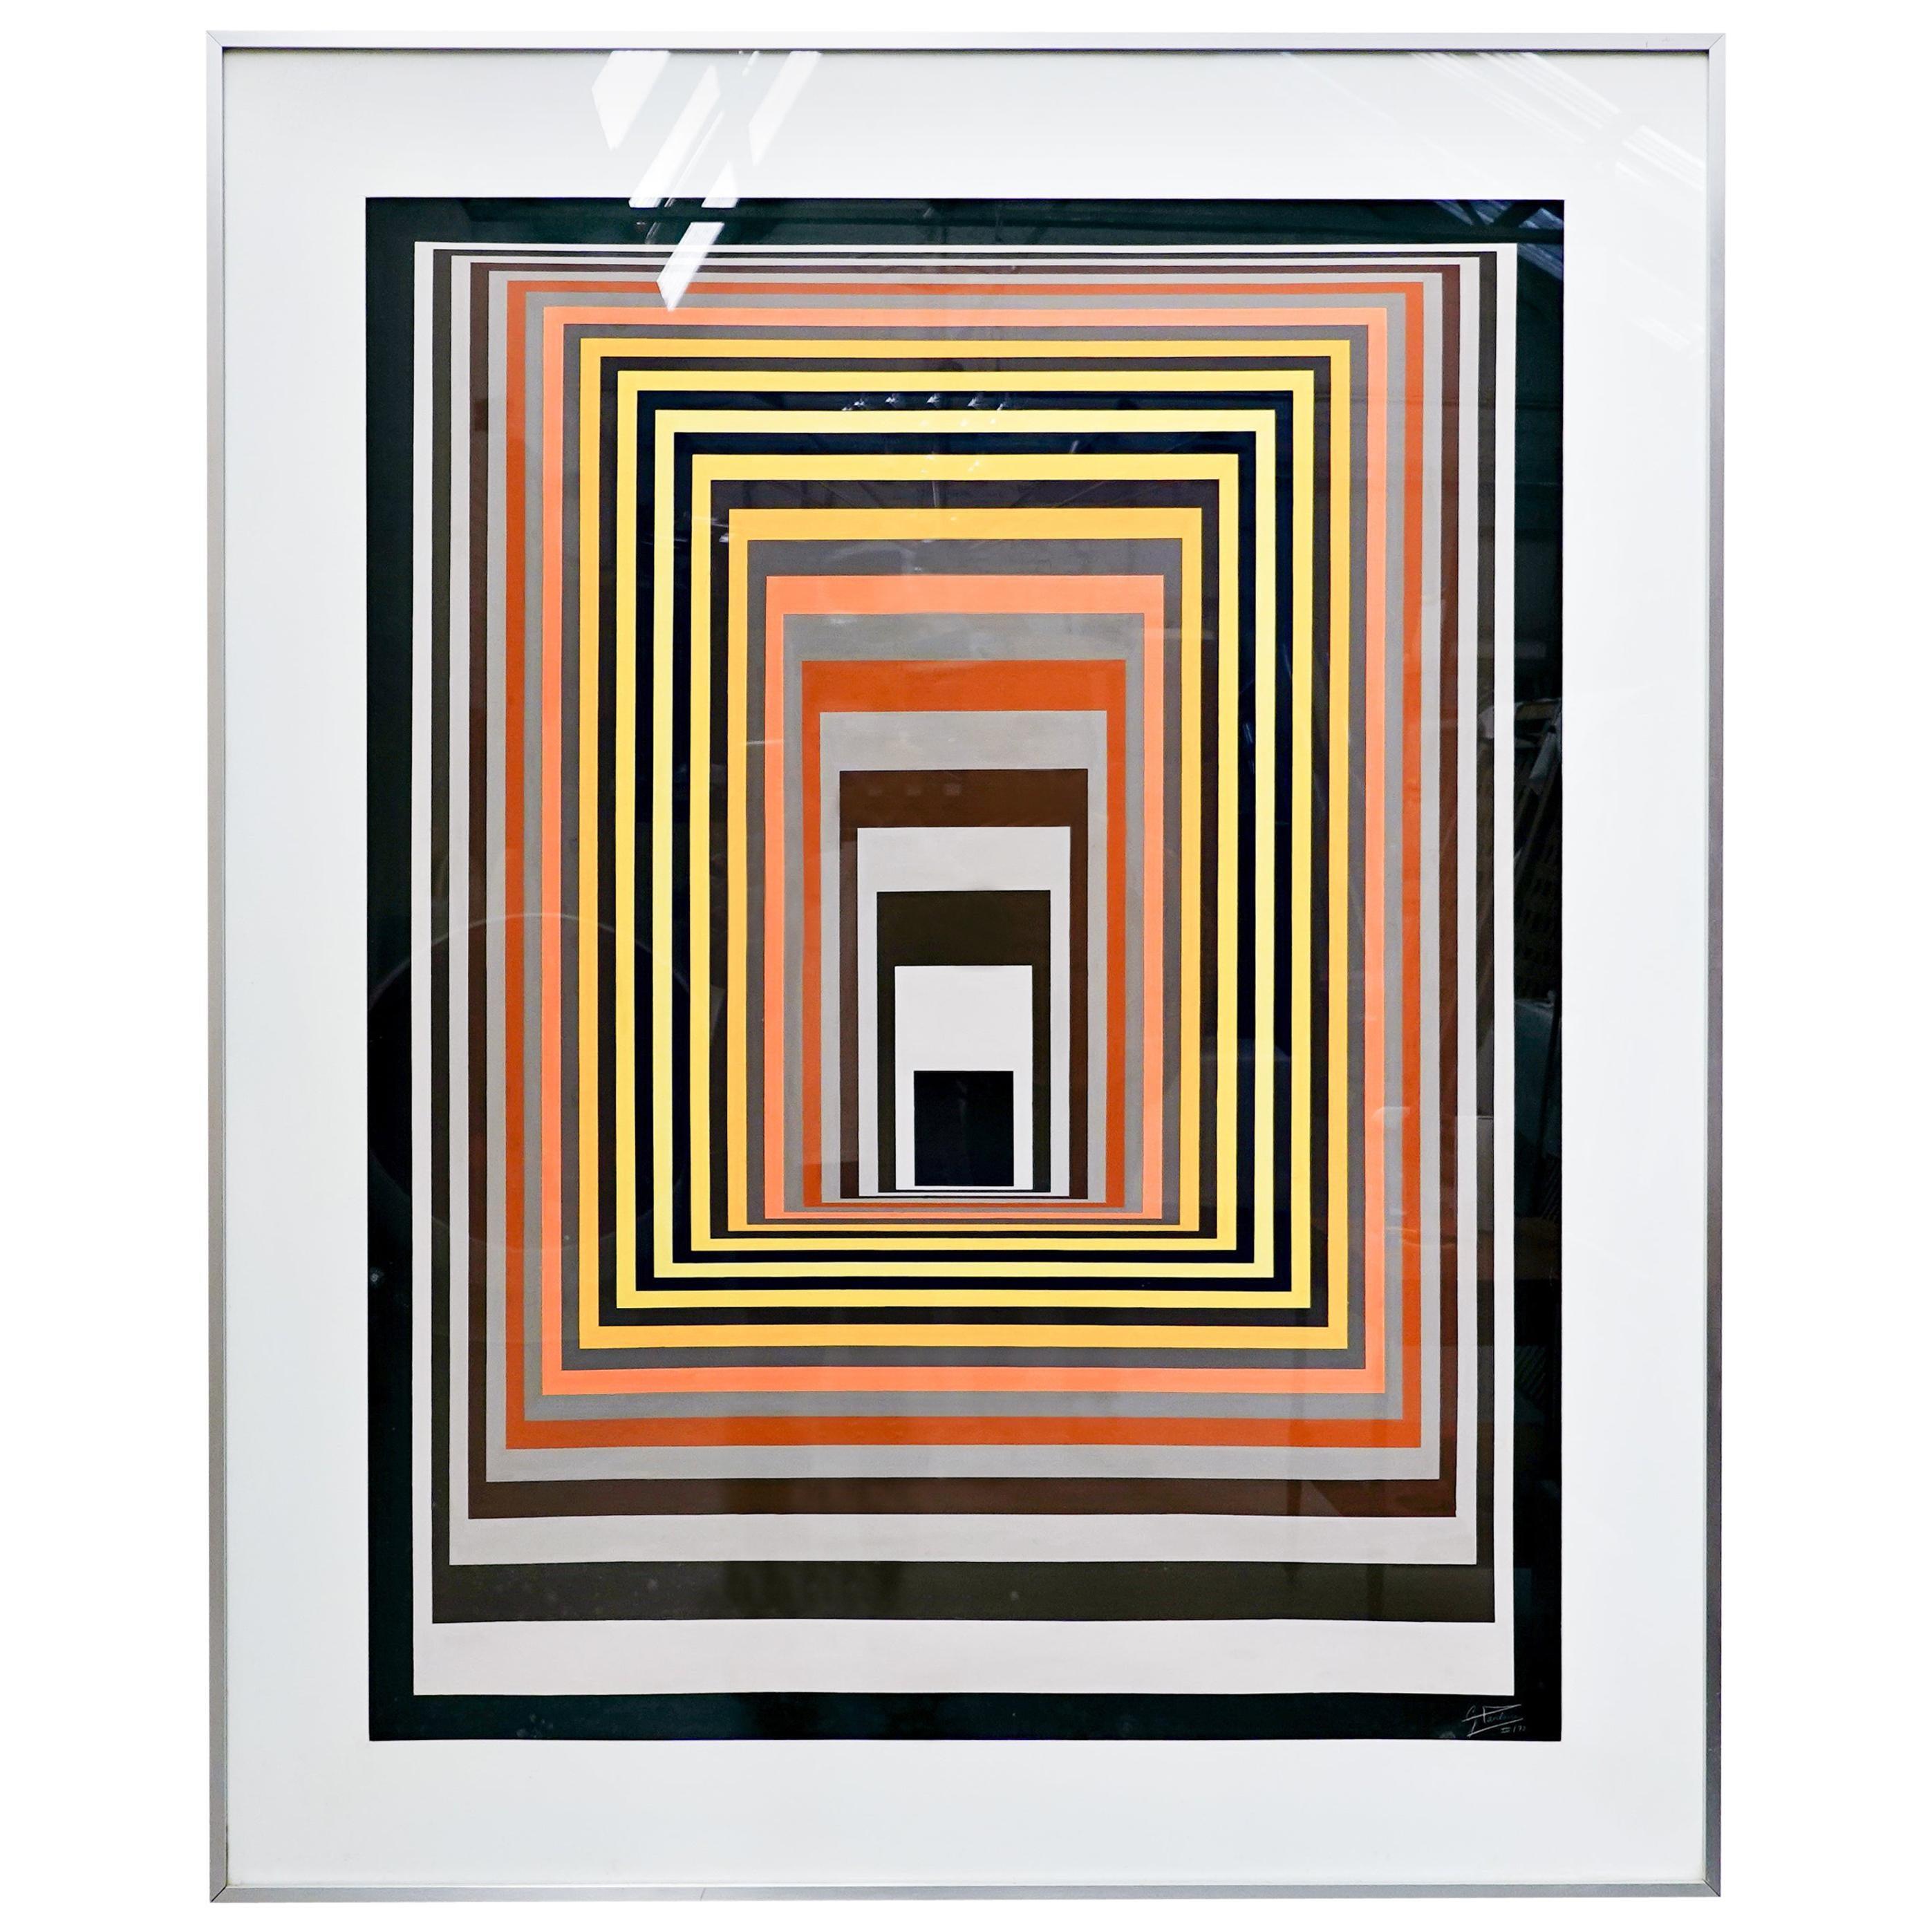 Georges Vaxelaire, Gouache on Paper, 1972, Belgium